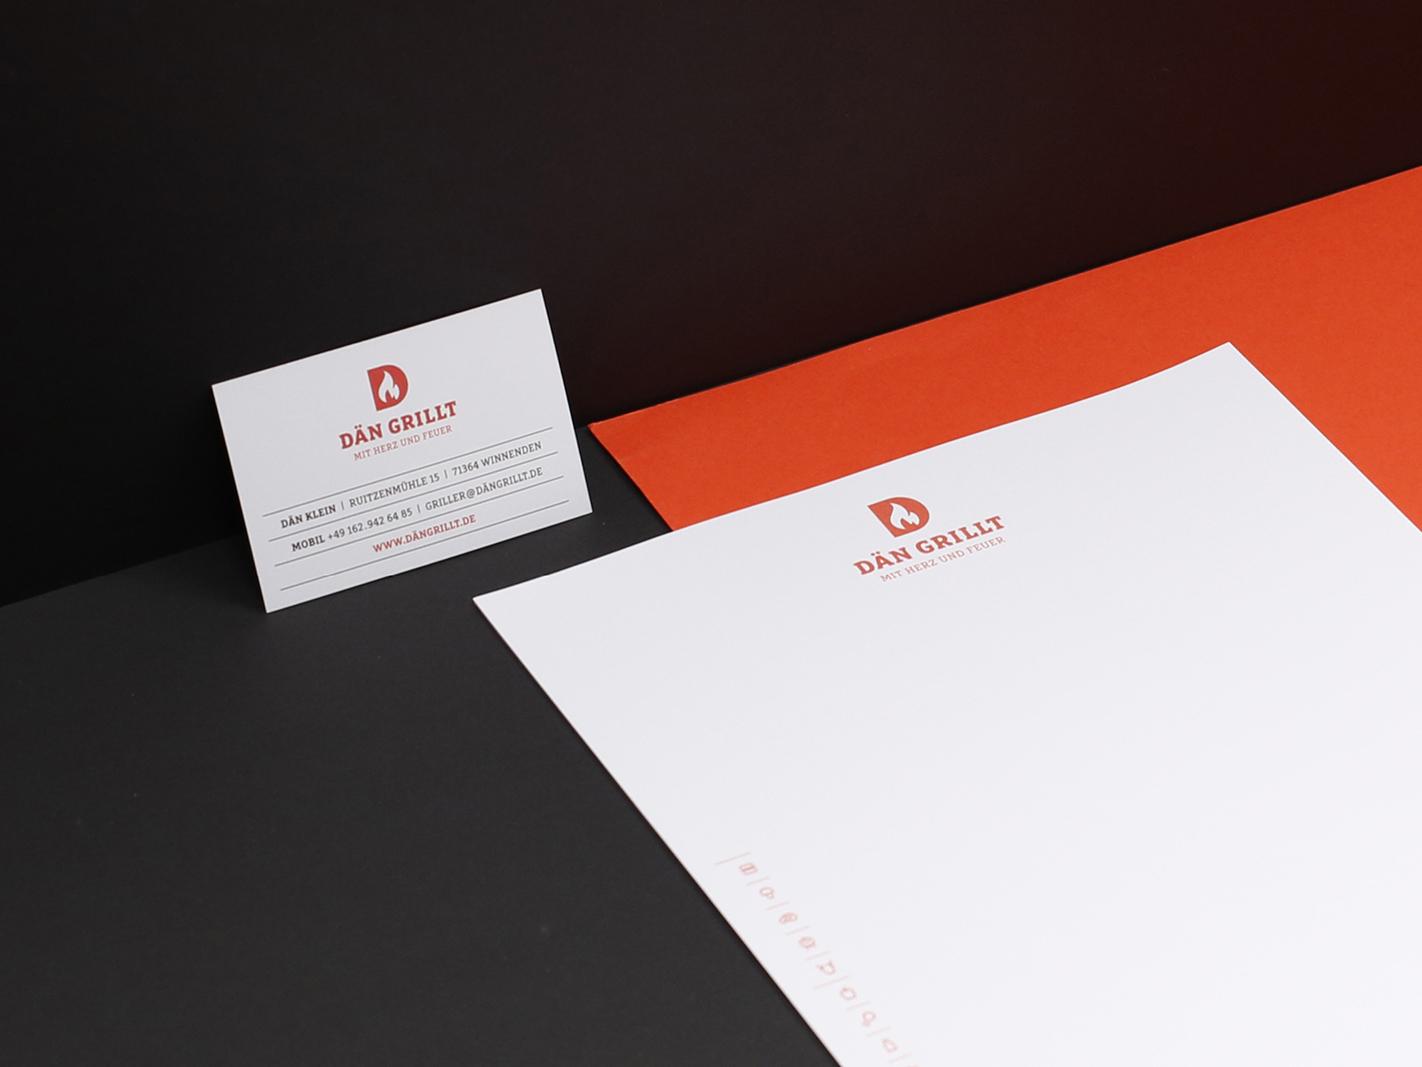 ATK-DAN-GRILLT-Corporate-Design-3.jpg